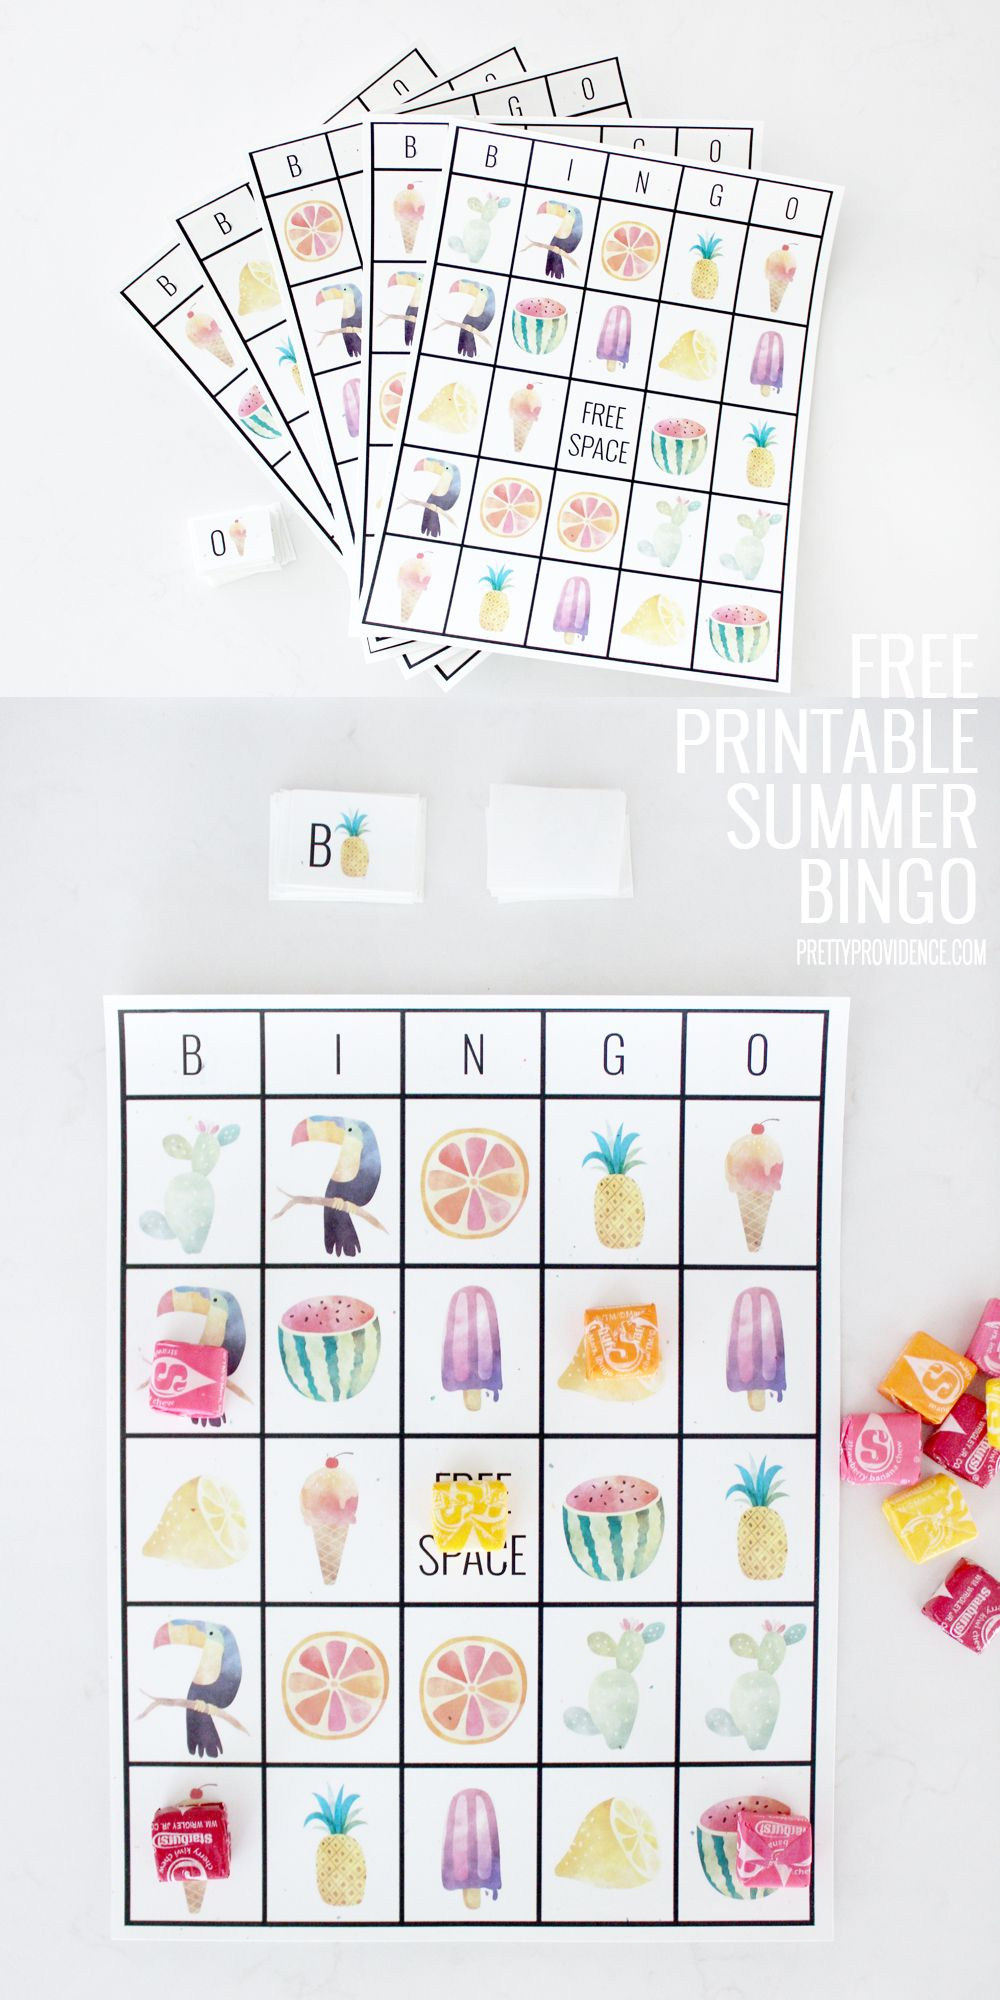 Free Printable Adorable Summer Bingo Cards | Free Printable